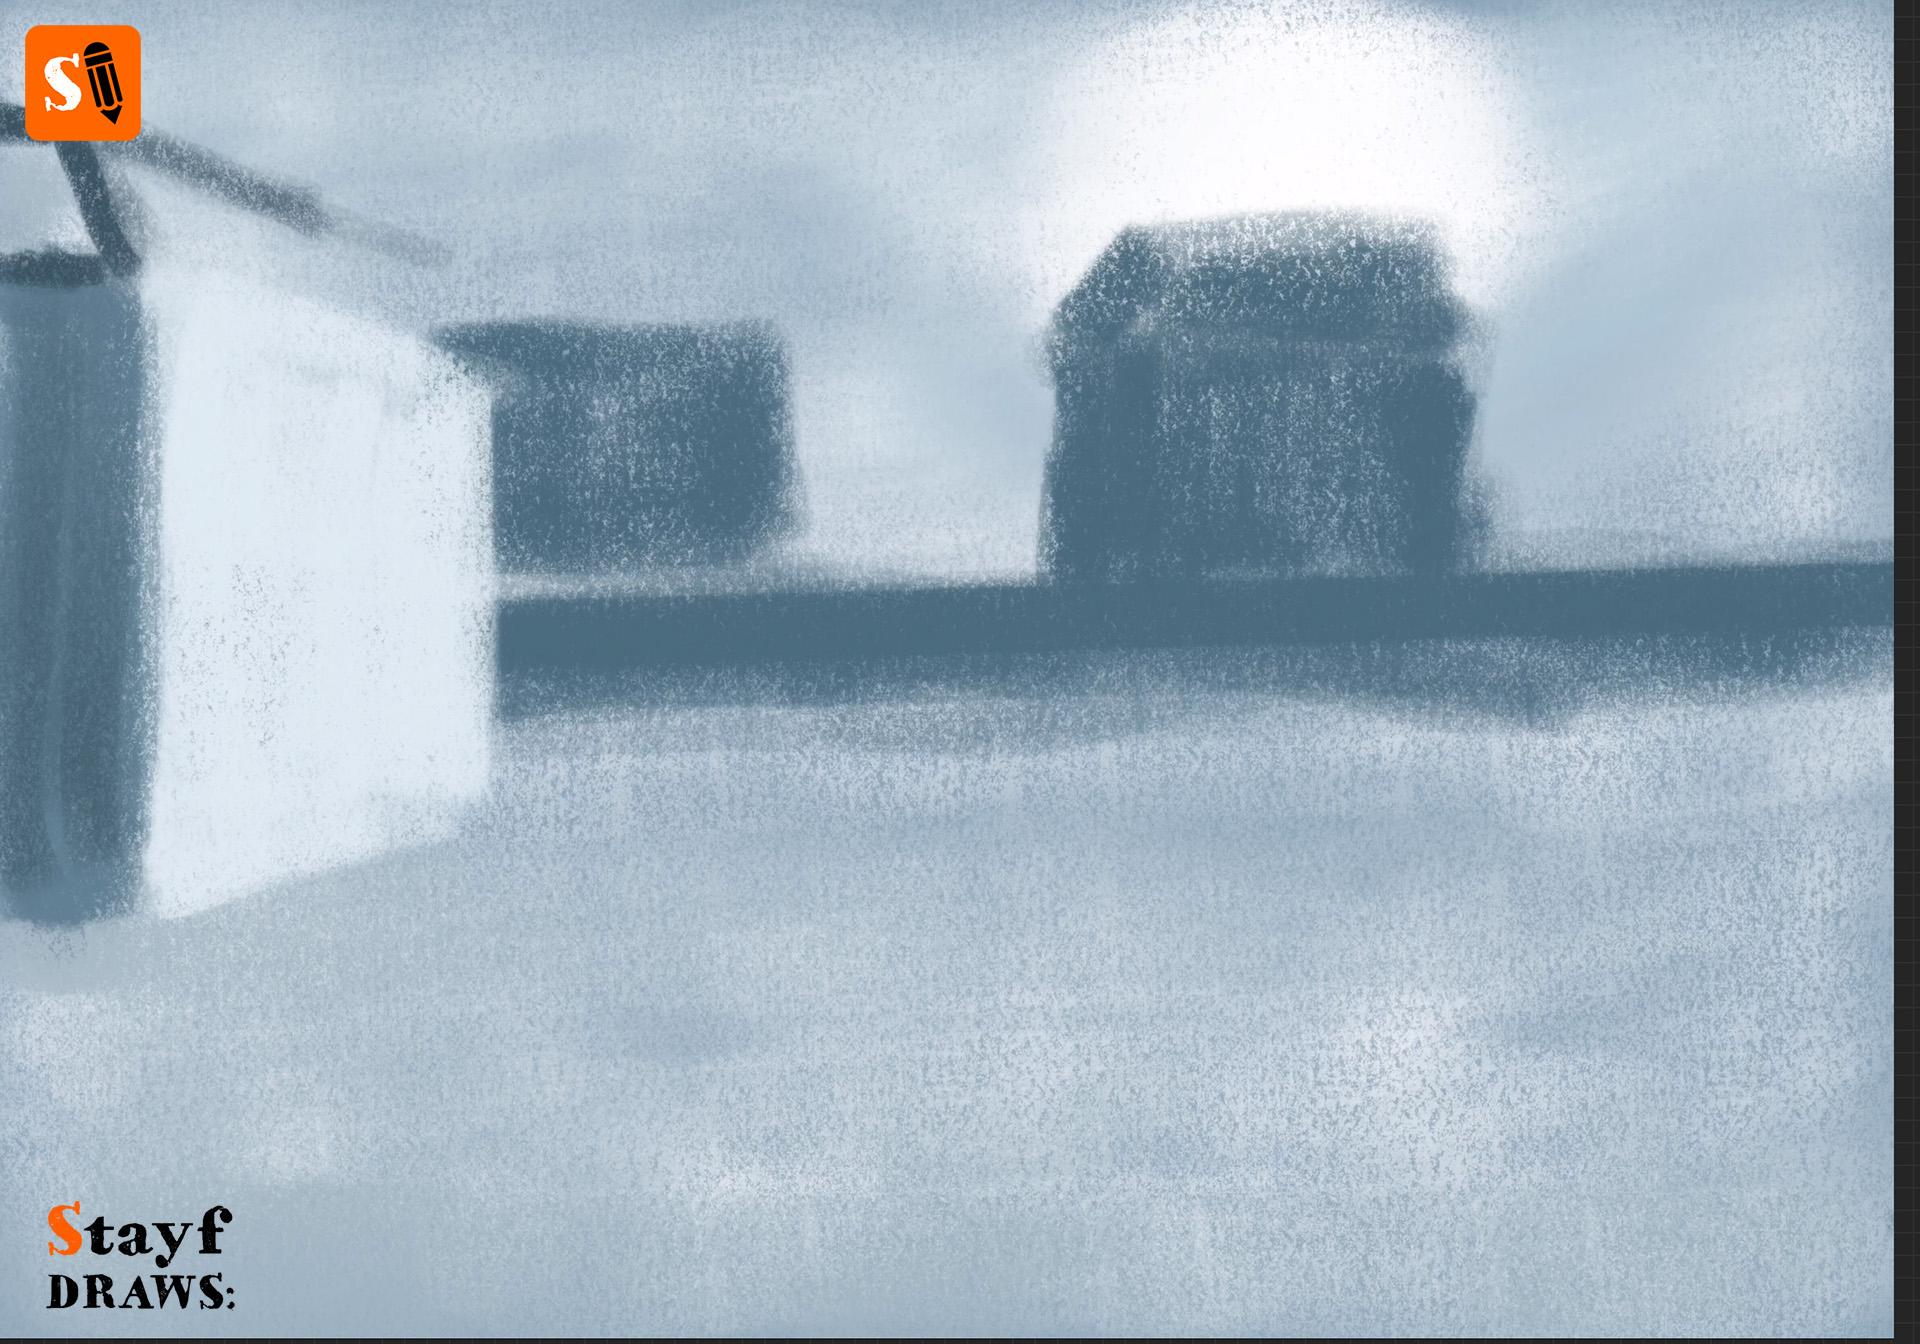 StayfDraws-Procreate-Pastels-Winterlandscape1